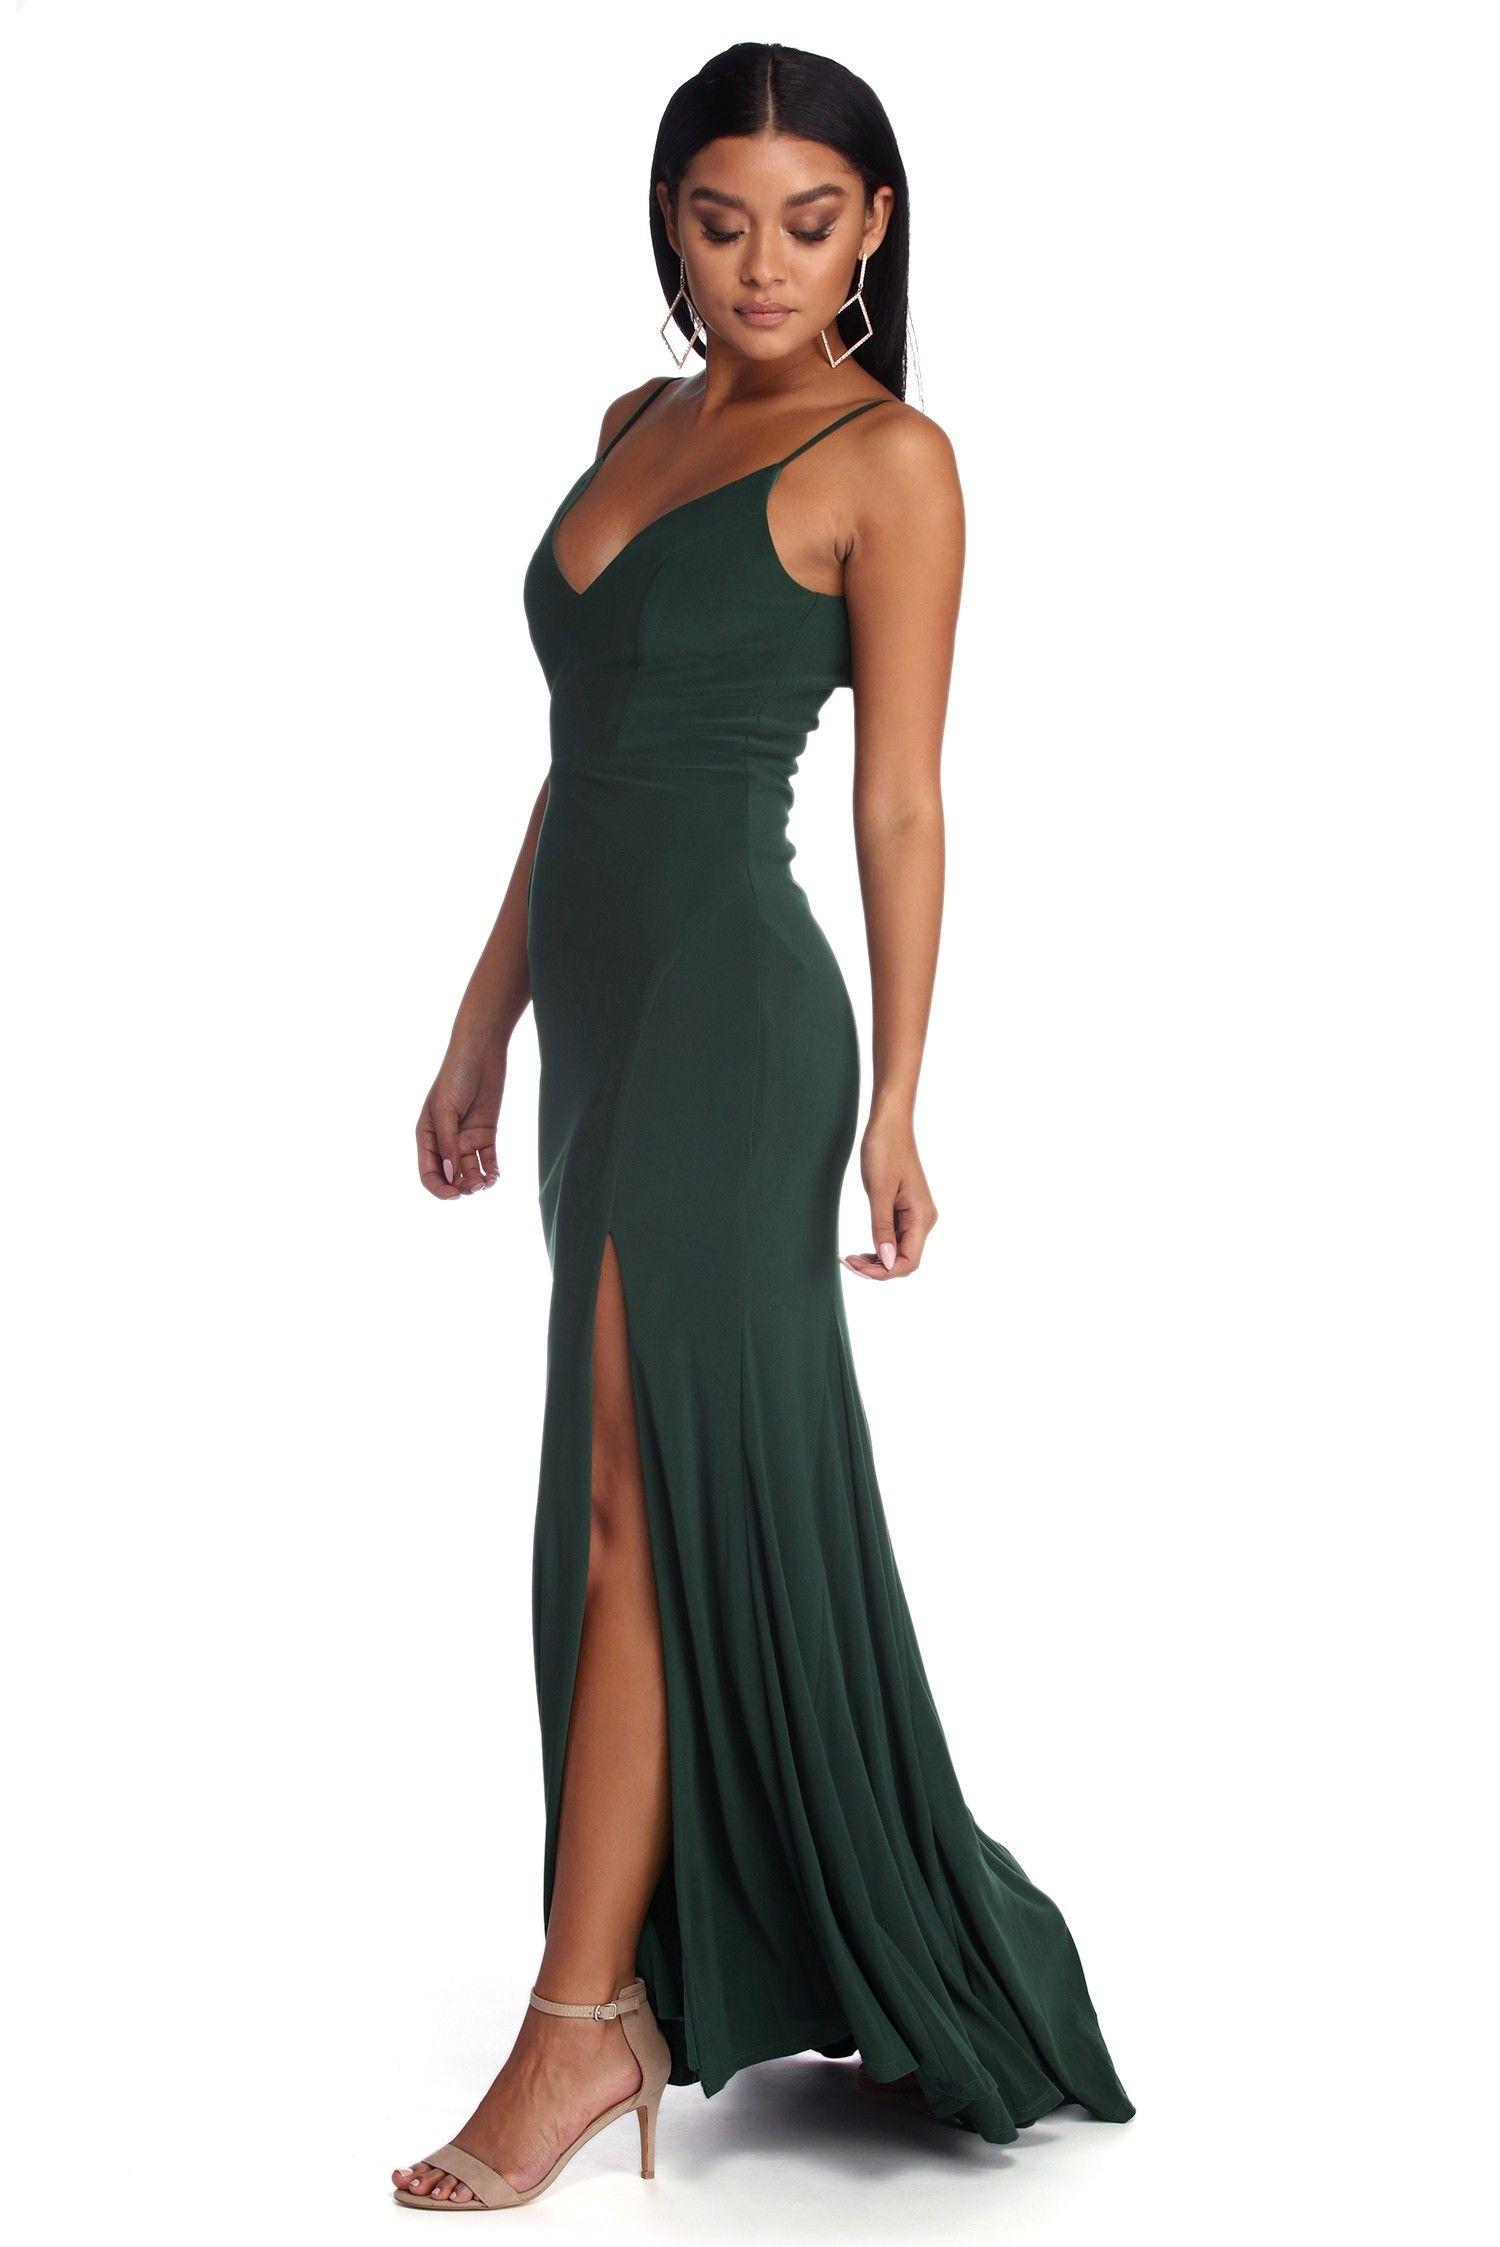 aa5c38749a2e Addie Formal High Slit Dress | prom dresses | High slit dress, Slit ...